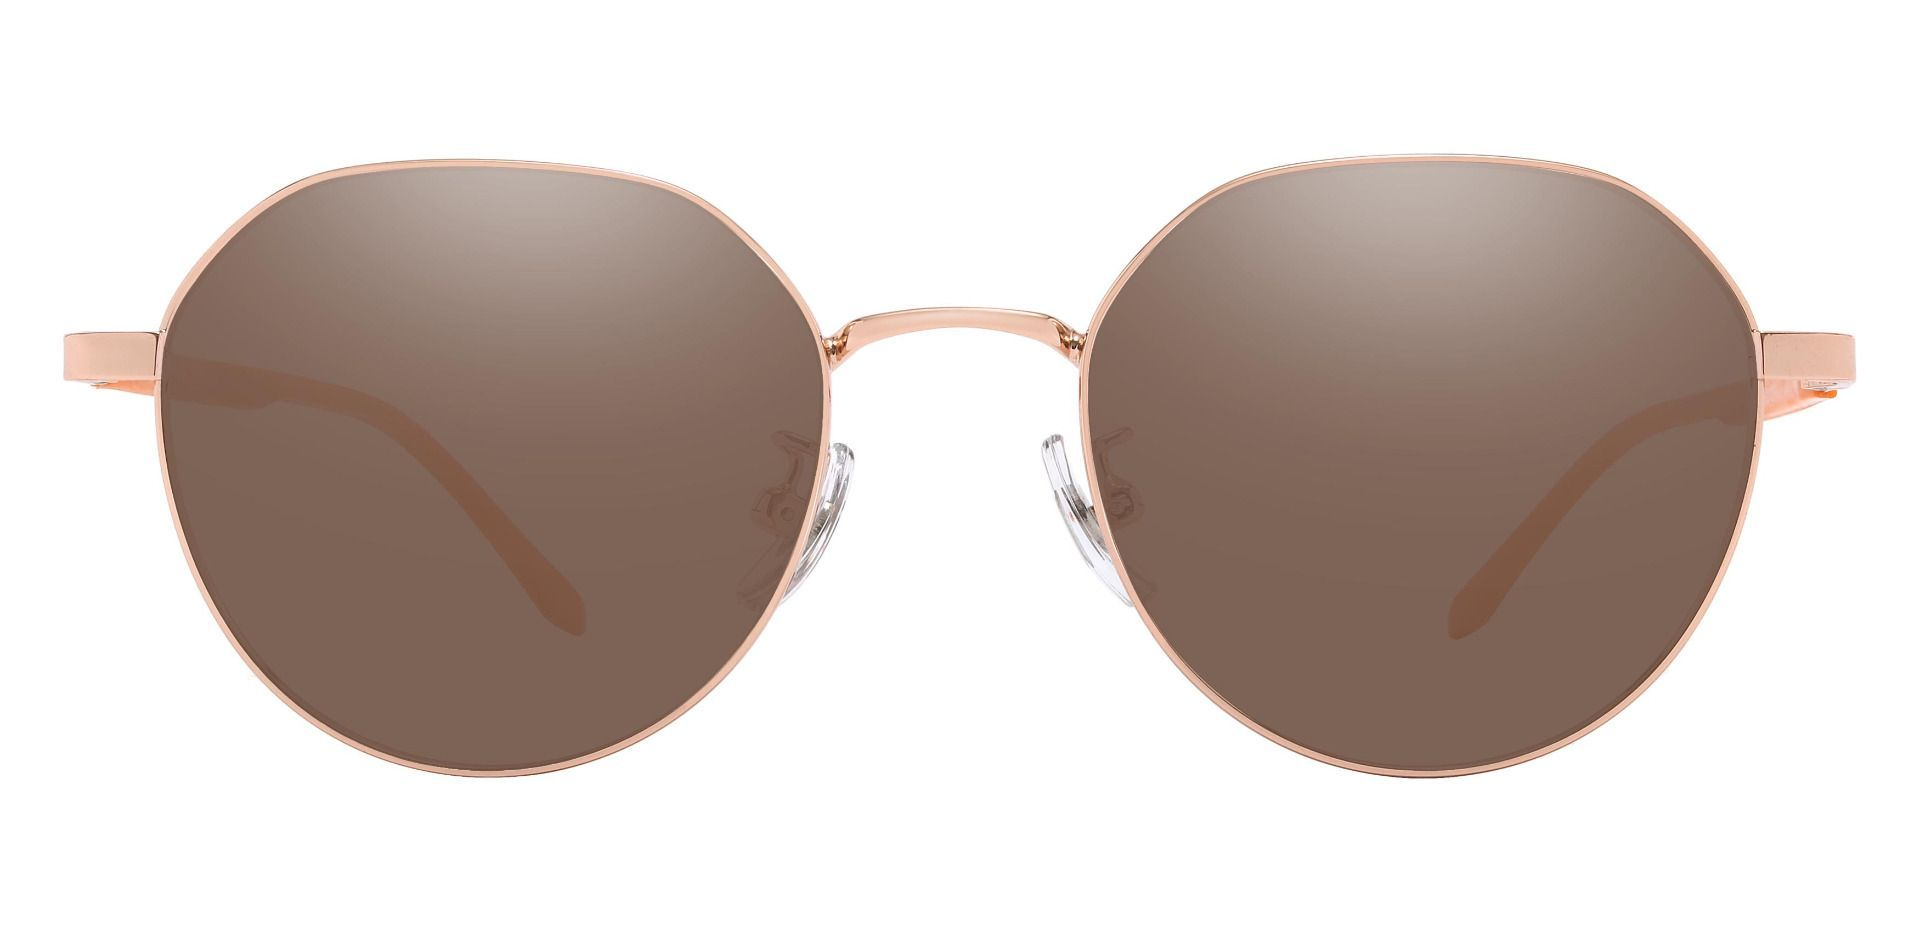 Beatrice Geometric Prescription Sunglasses - Gold Frame With Brown Lenses